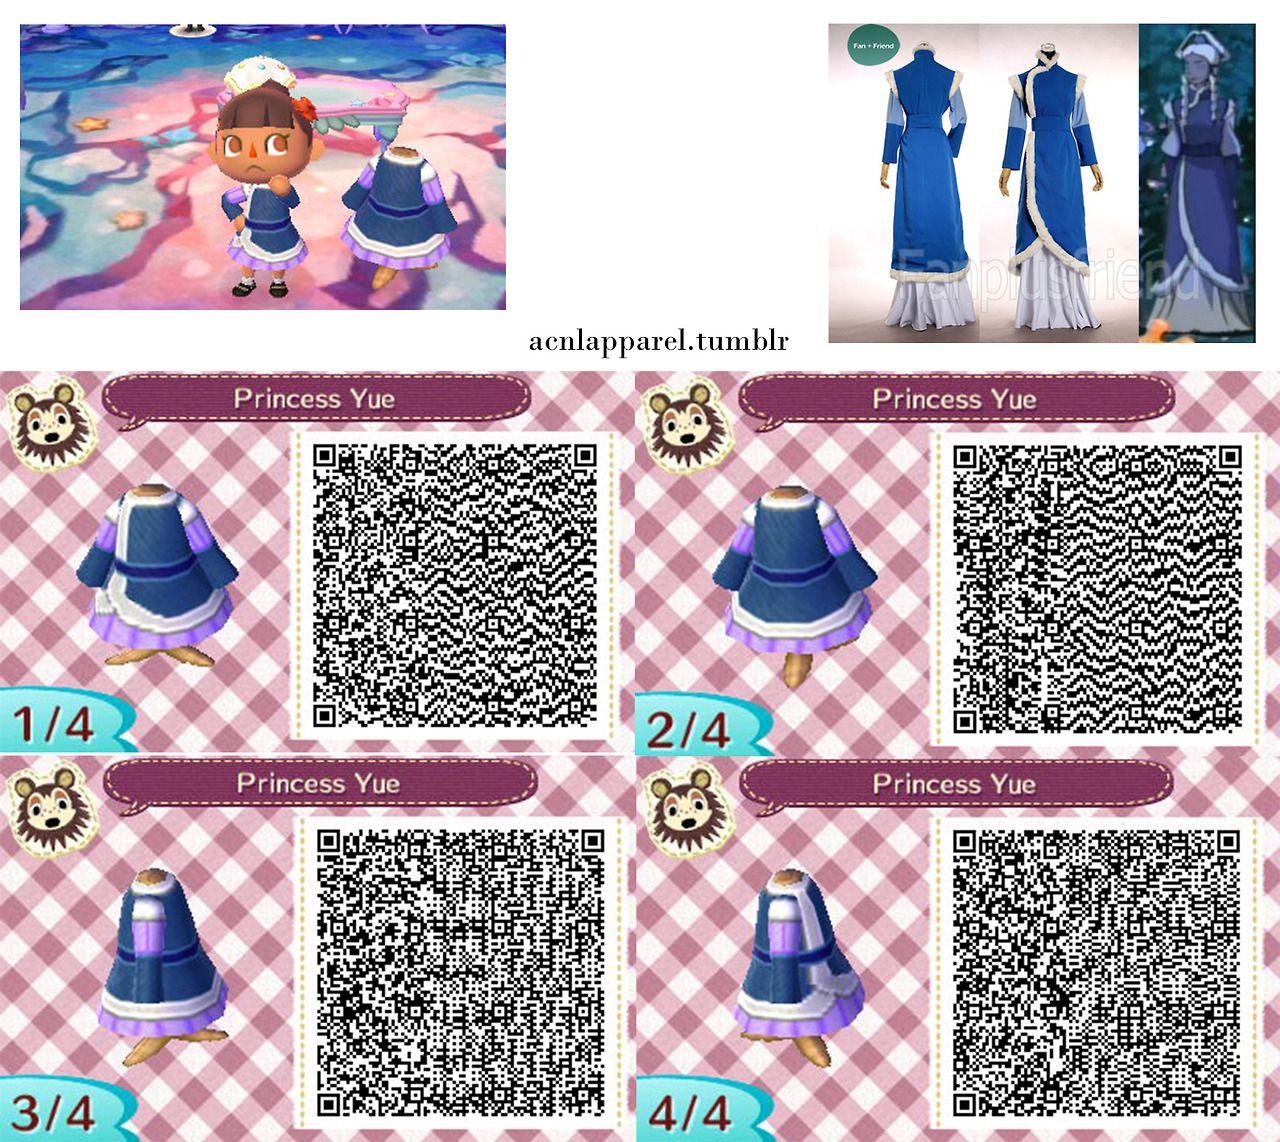 Princess Yue From Avatar Qr Code Qr Codes Animals Animal Crossing Qr Qr Codes Animal Crossing